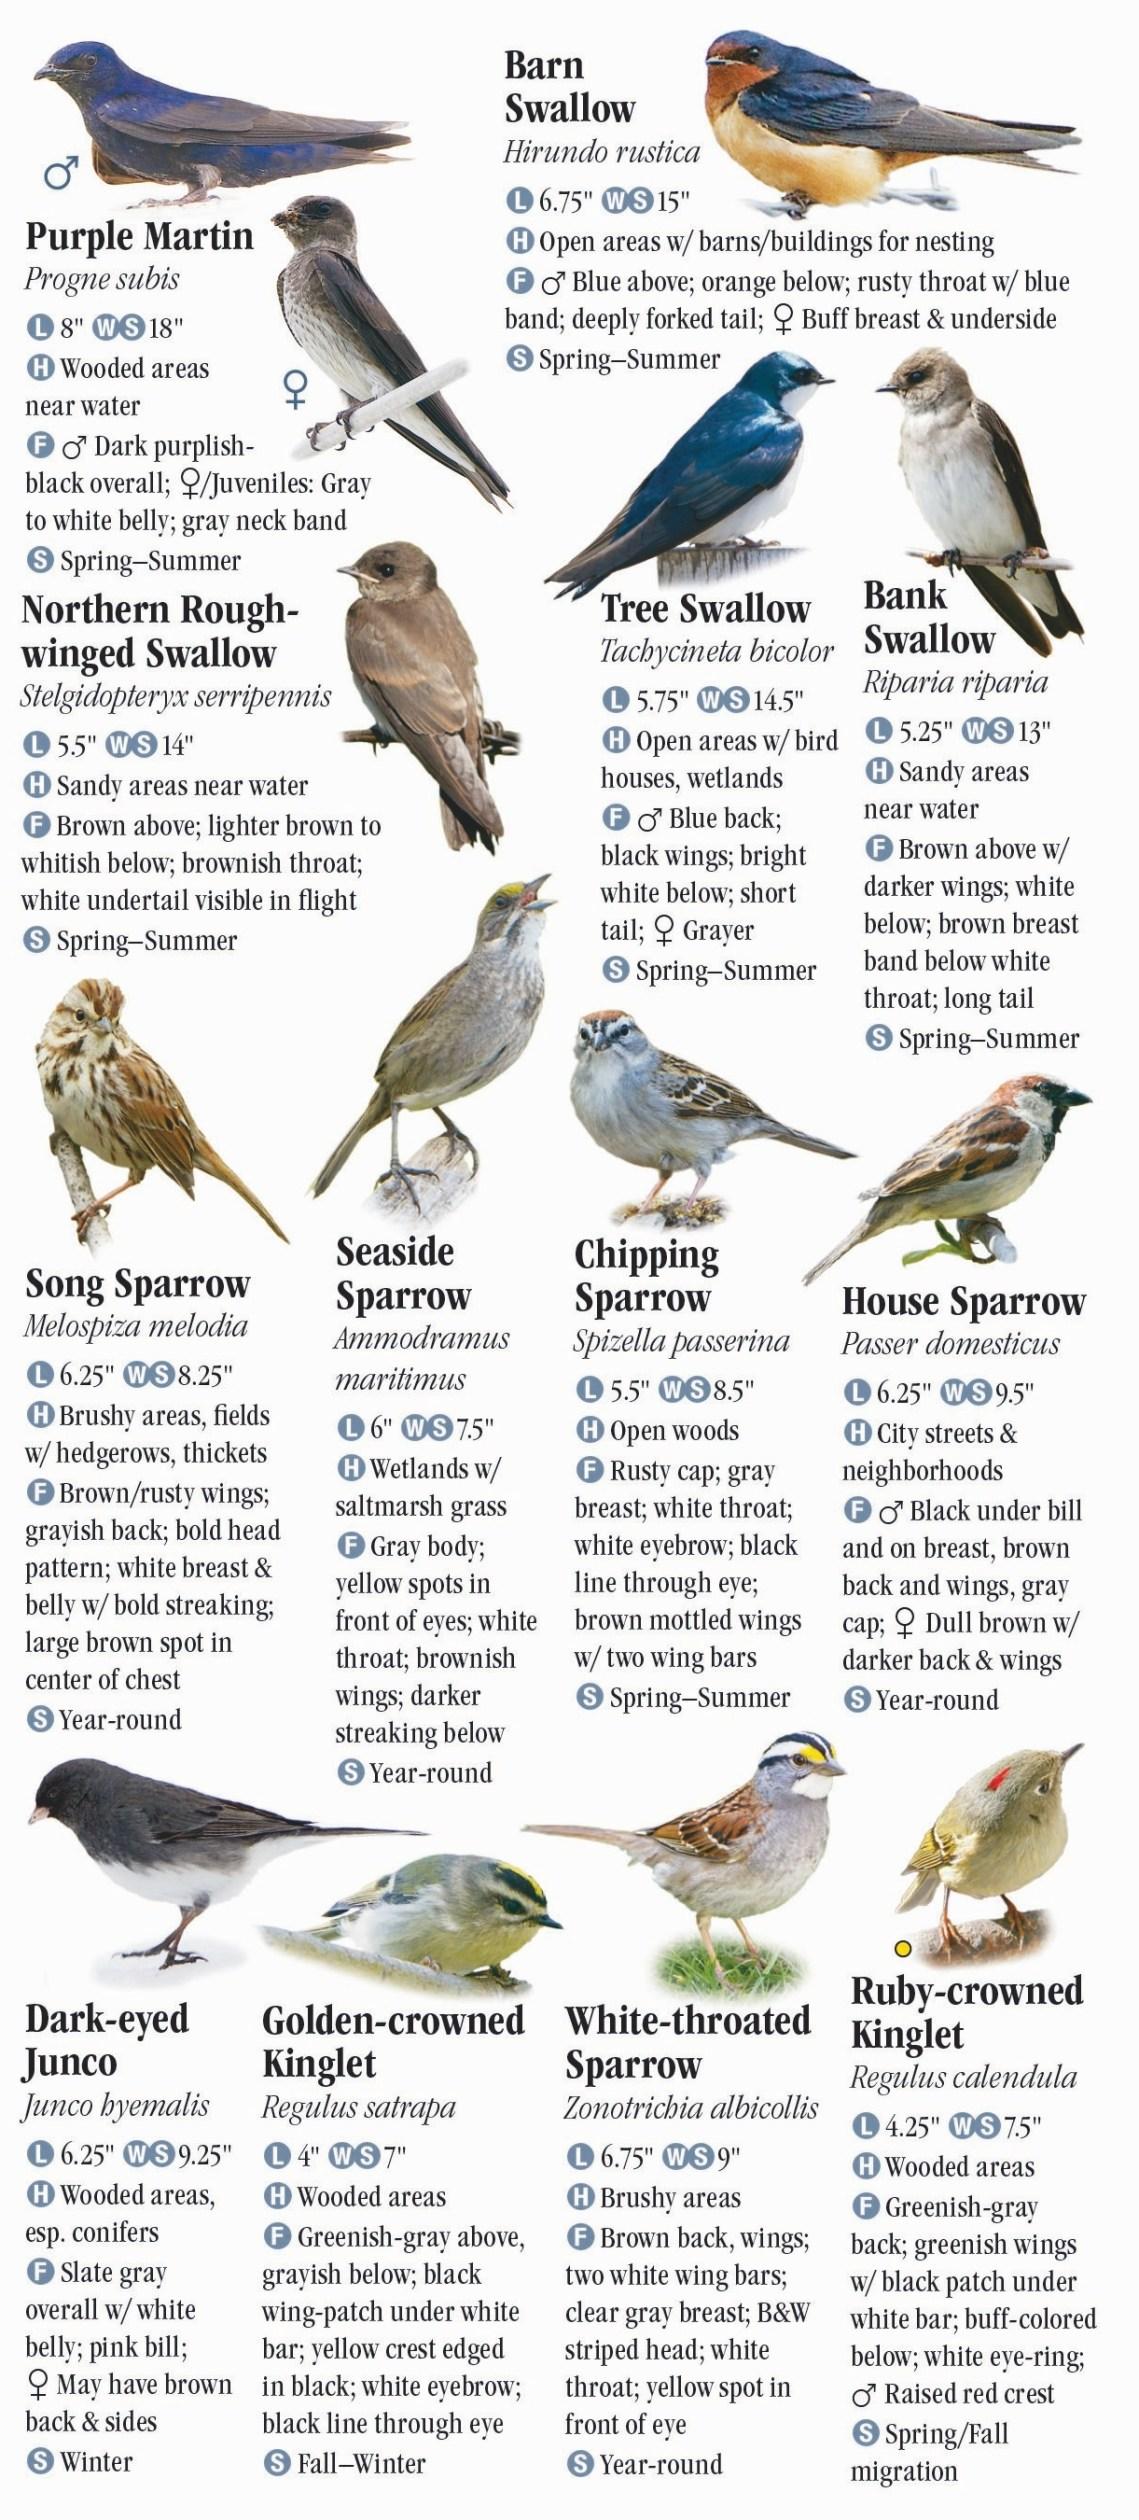 Animal House Back Bar - 182_Birds_-NYC_RP_12_Top Animal House Back Bar - 182_Birds_-NYC_RP_12  Snapshot_304341.jpg